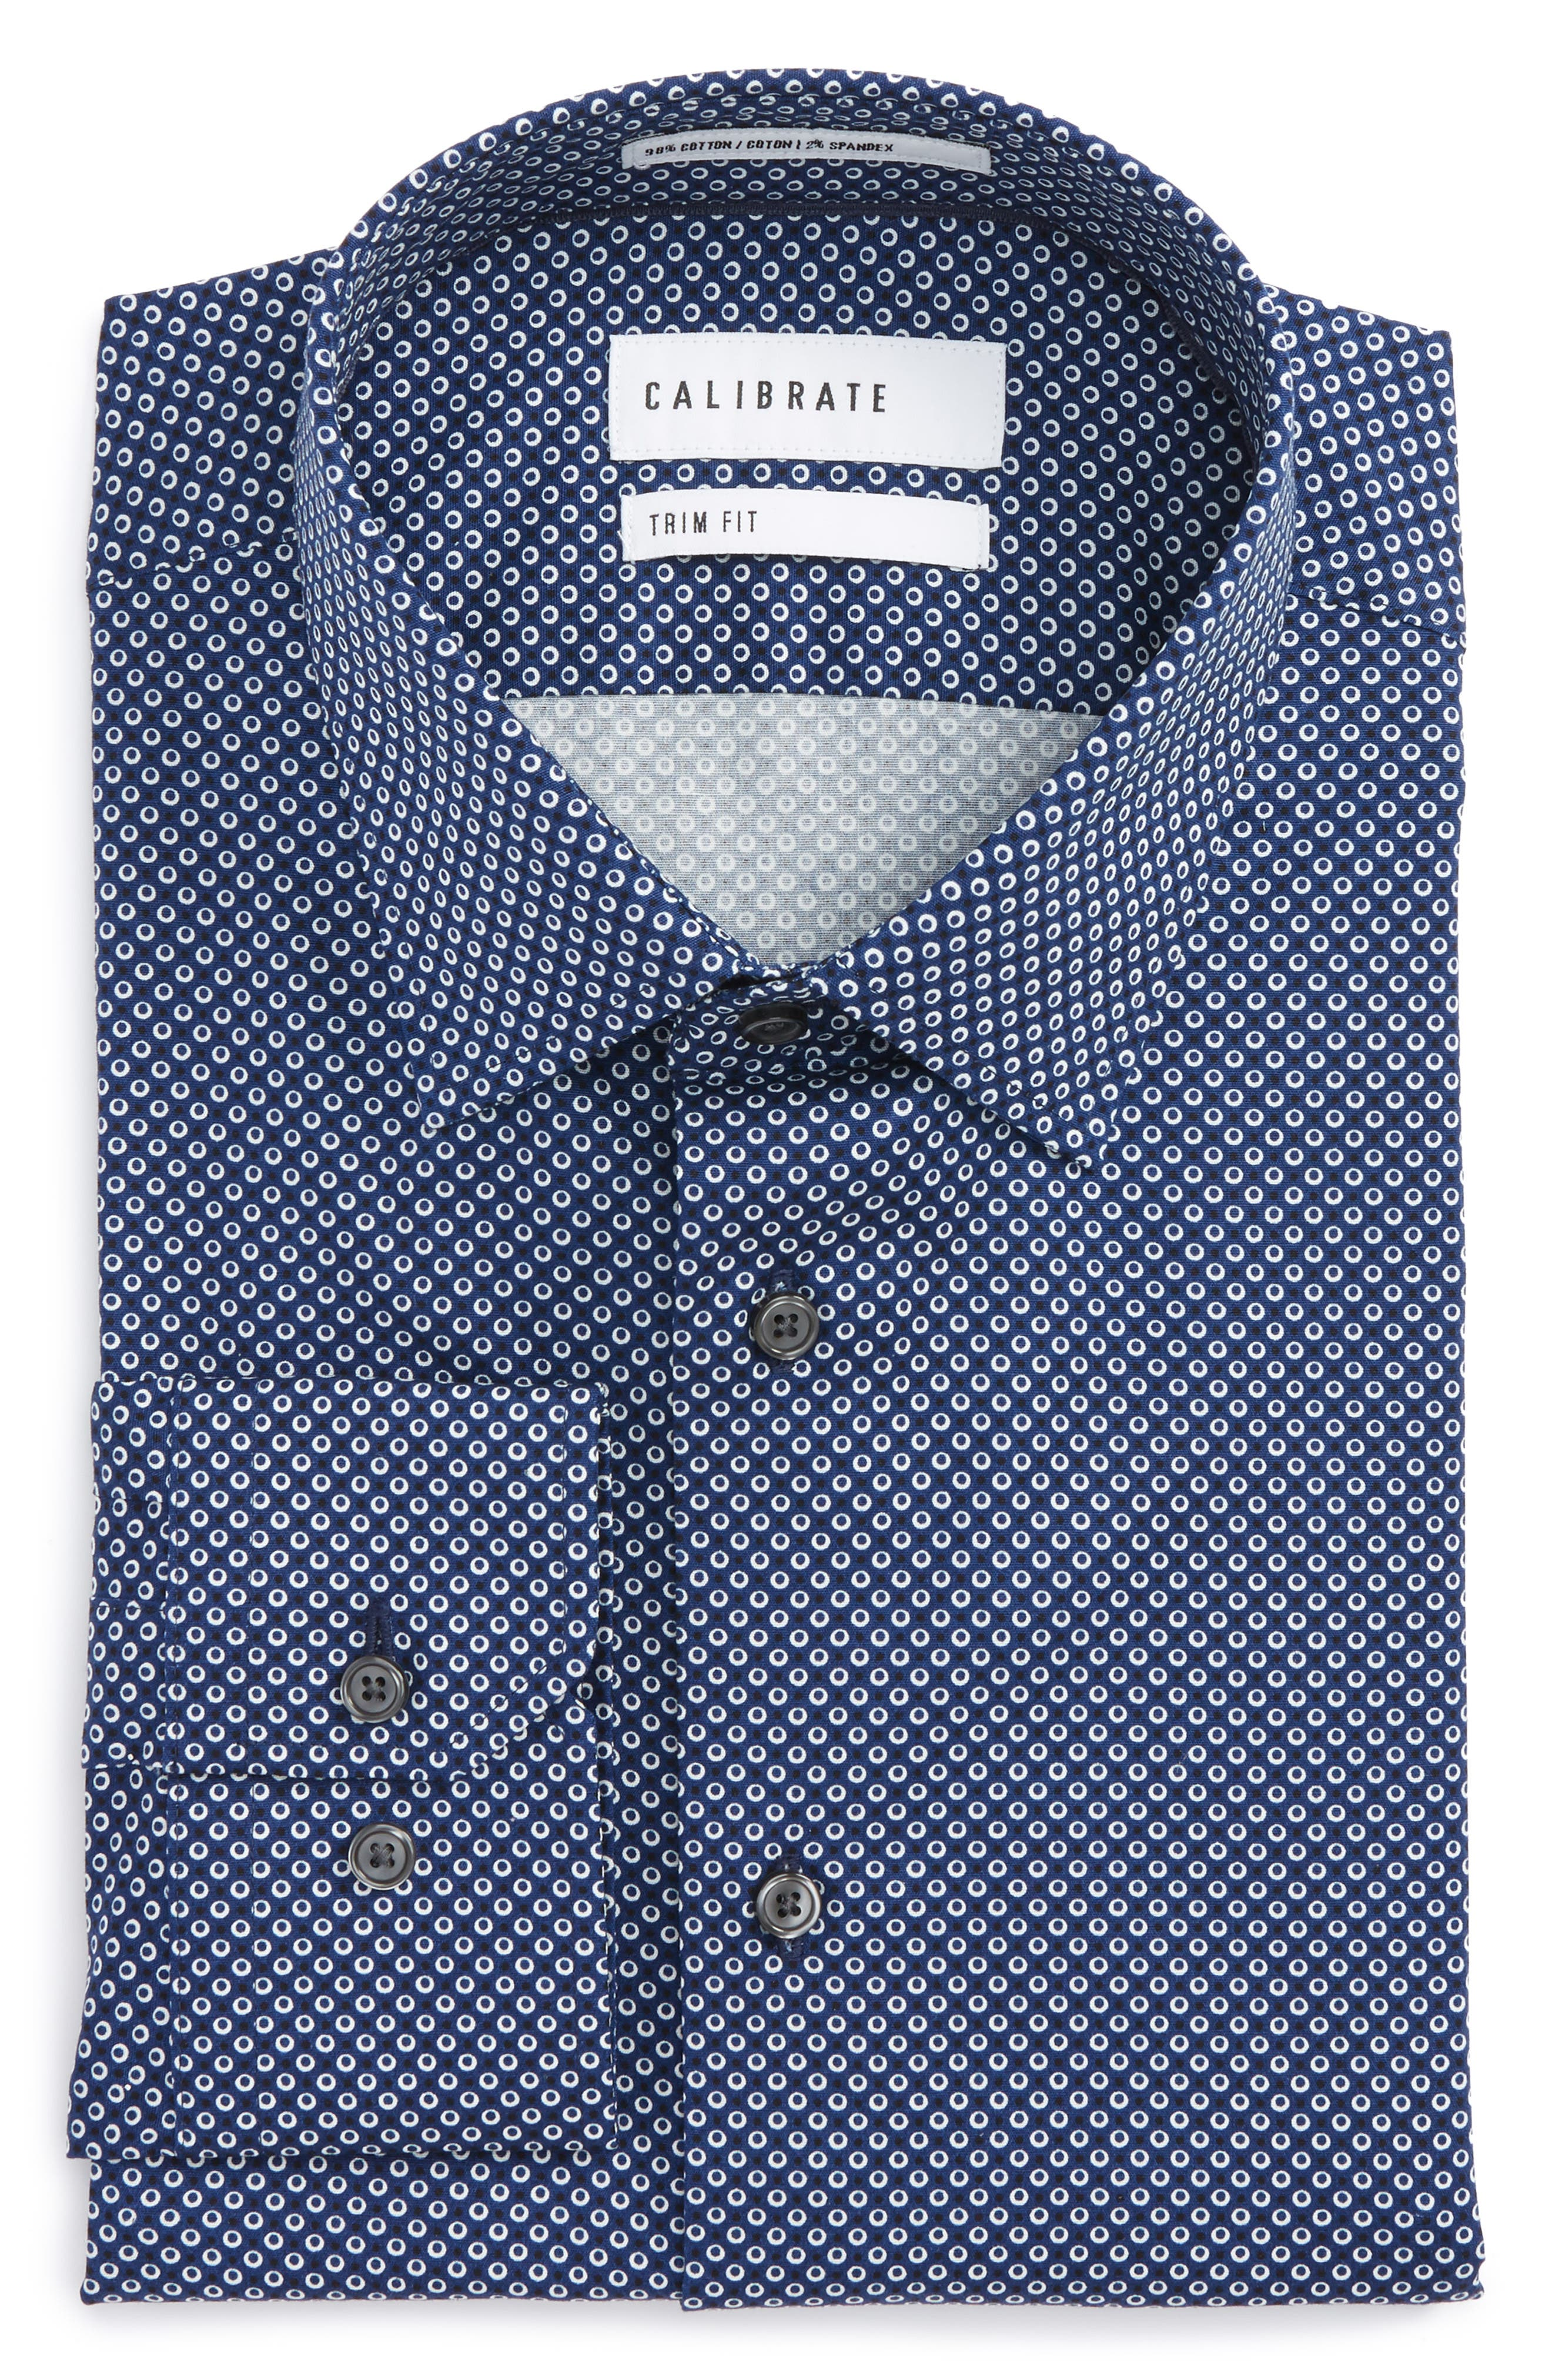 Alternate Image 1 Selected - Calibrate Trim Fit Dot Dress Shirt